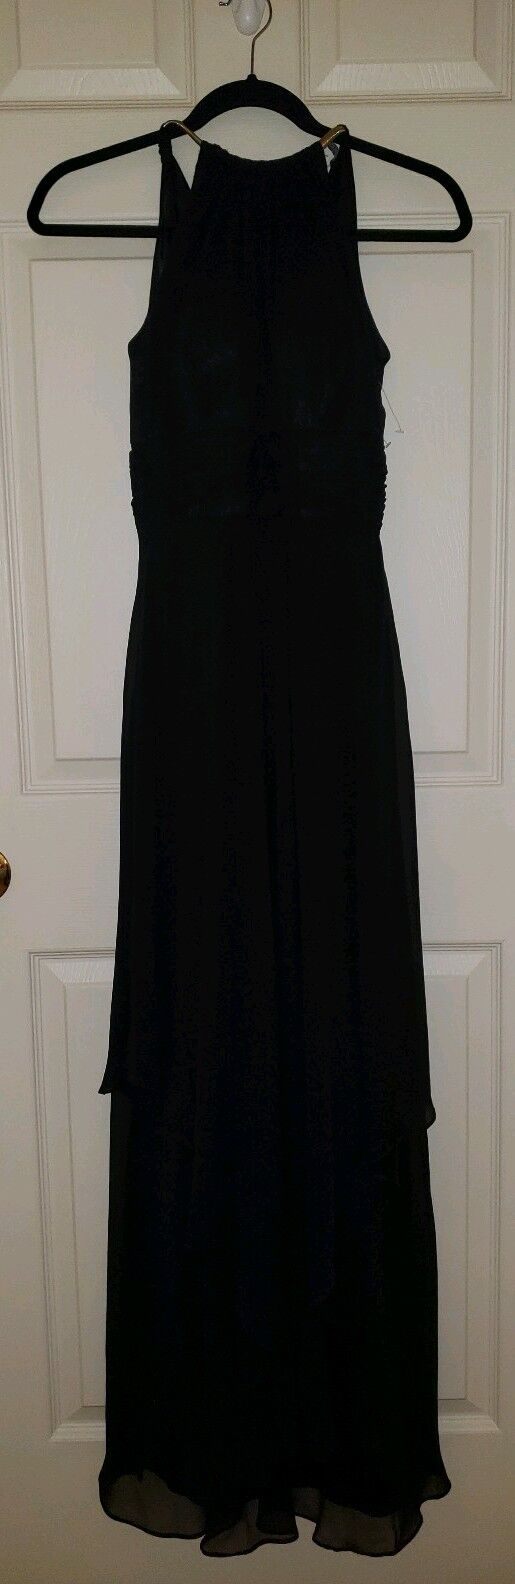 Eliza J, Full Length schwarz Gown, Größe 2, Never Worn.